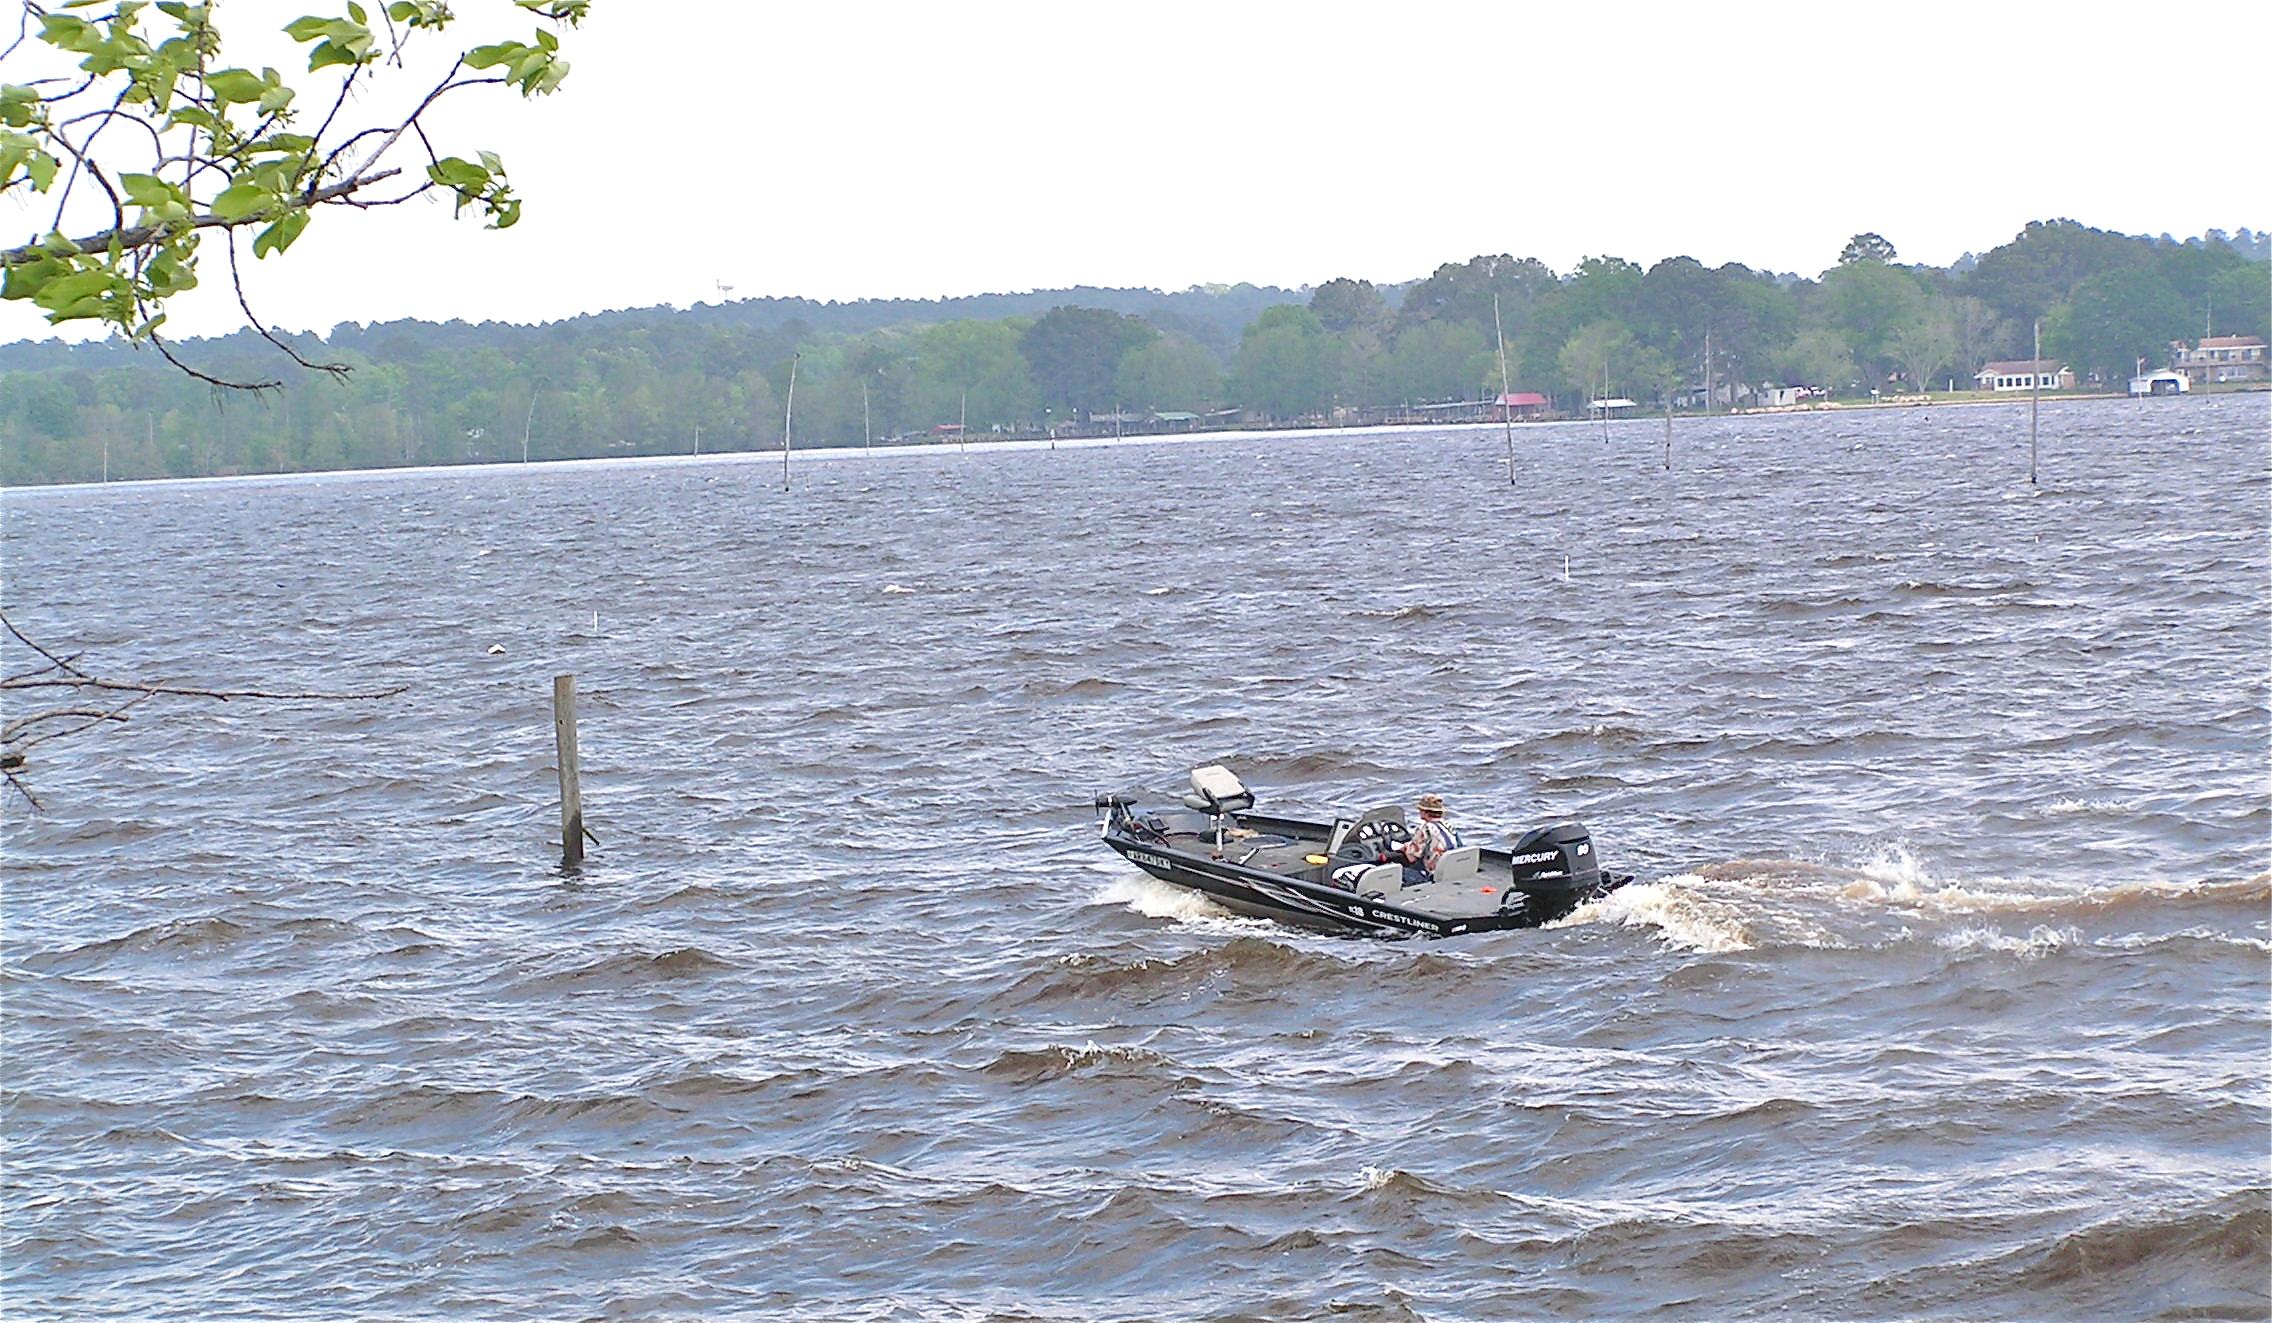 This week s fishing report lake darbonne life for Lake d arbonne fishing report